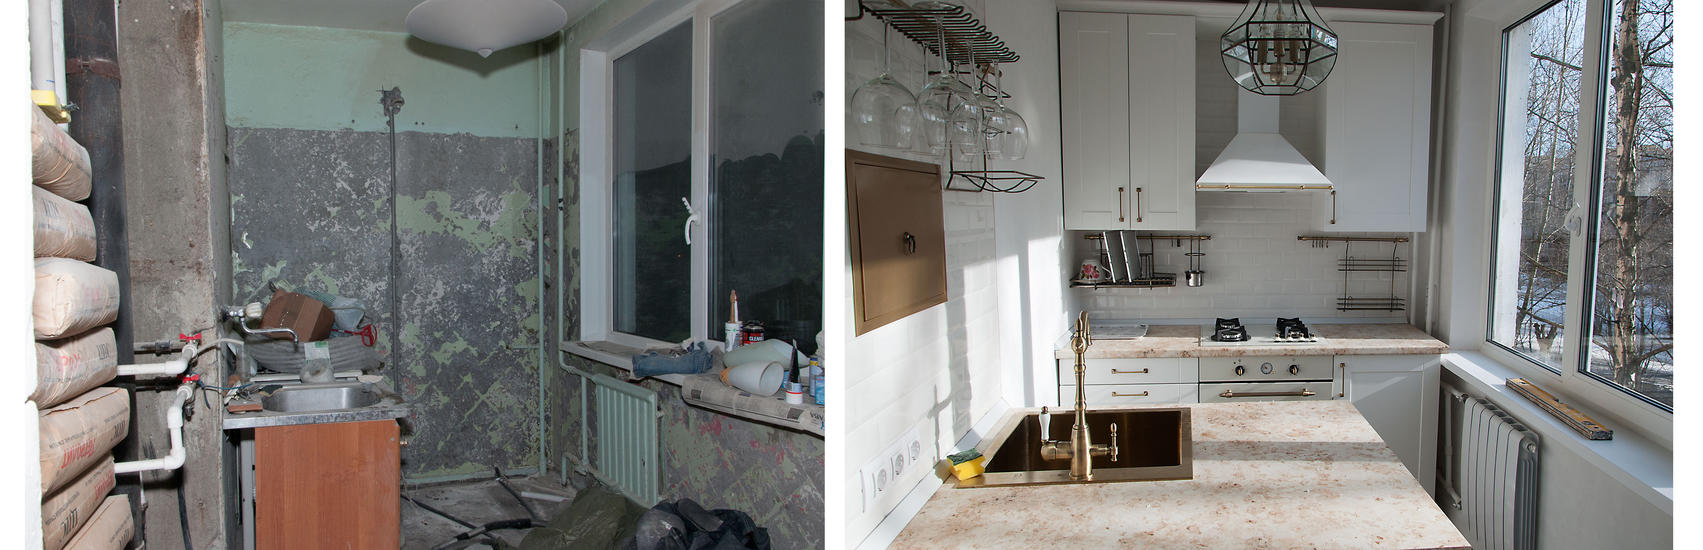 Фото квартир до ремонта и после своими руками